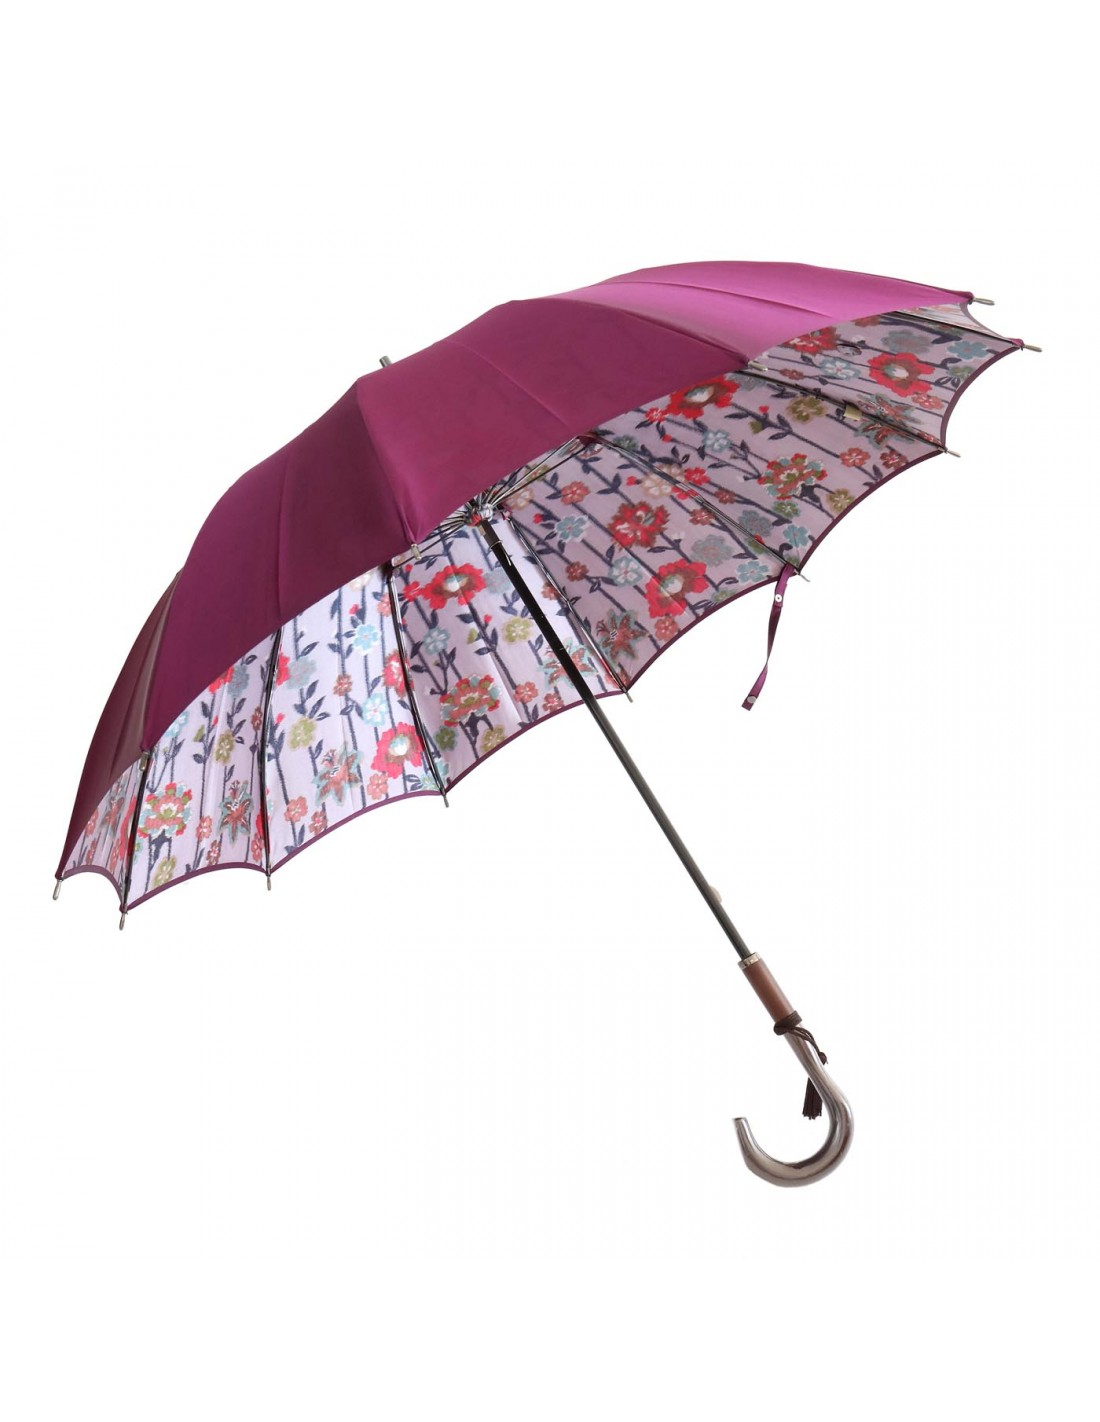 Damen Regenschirm Blumenmuster Violett